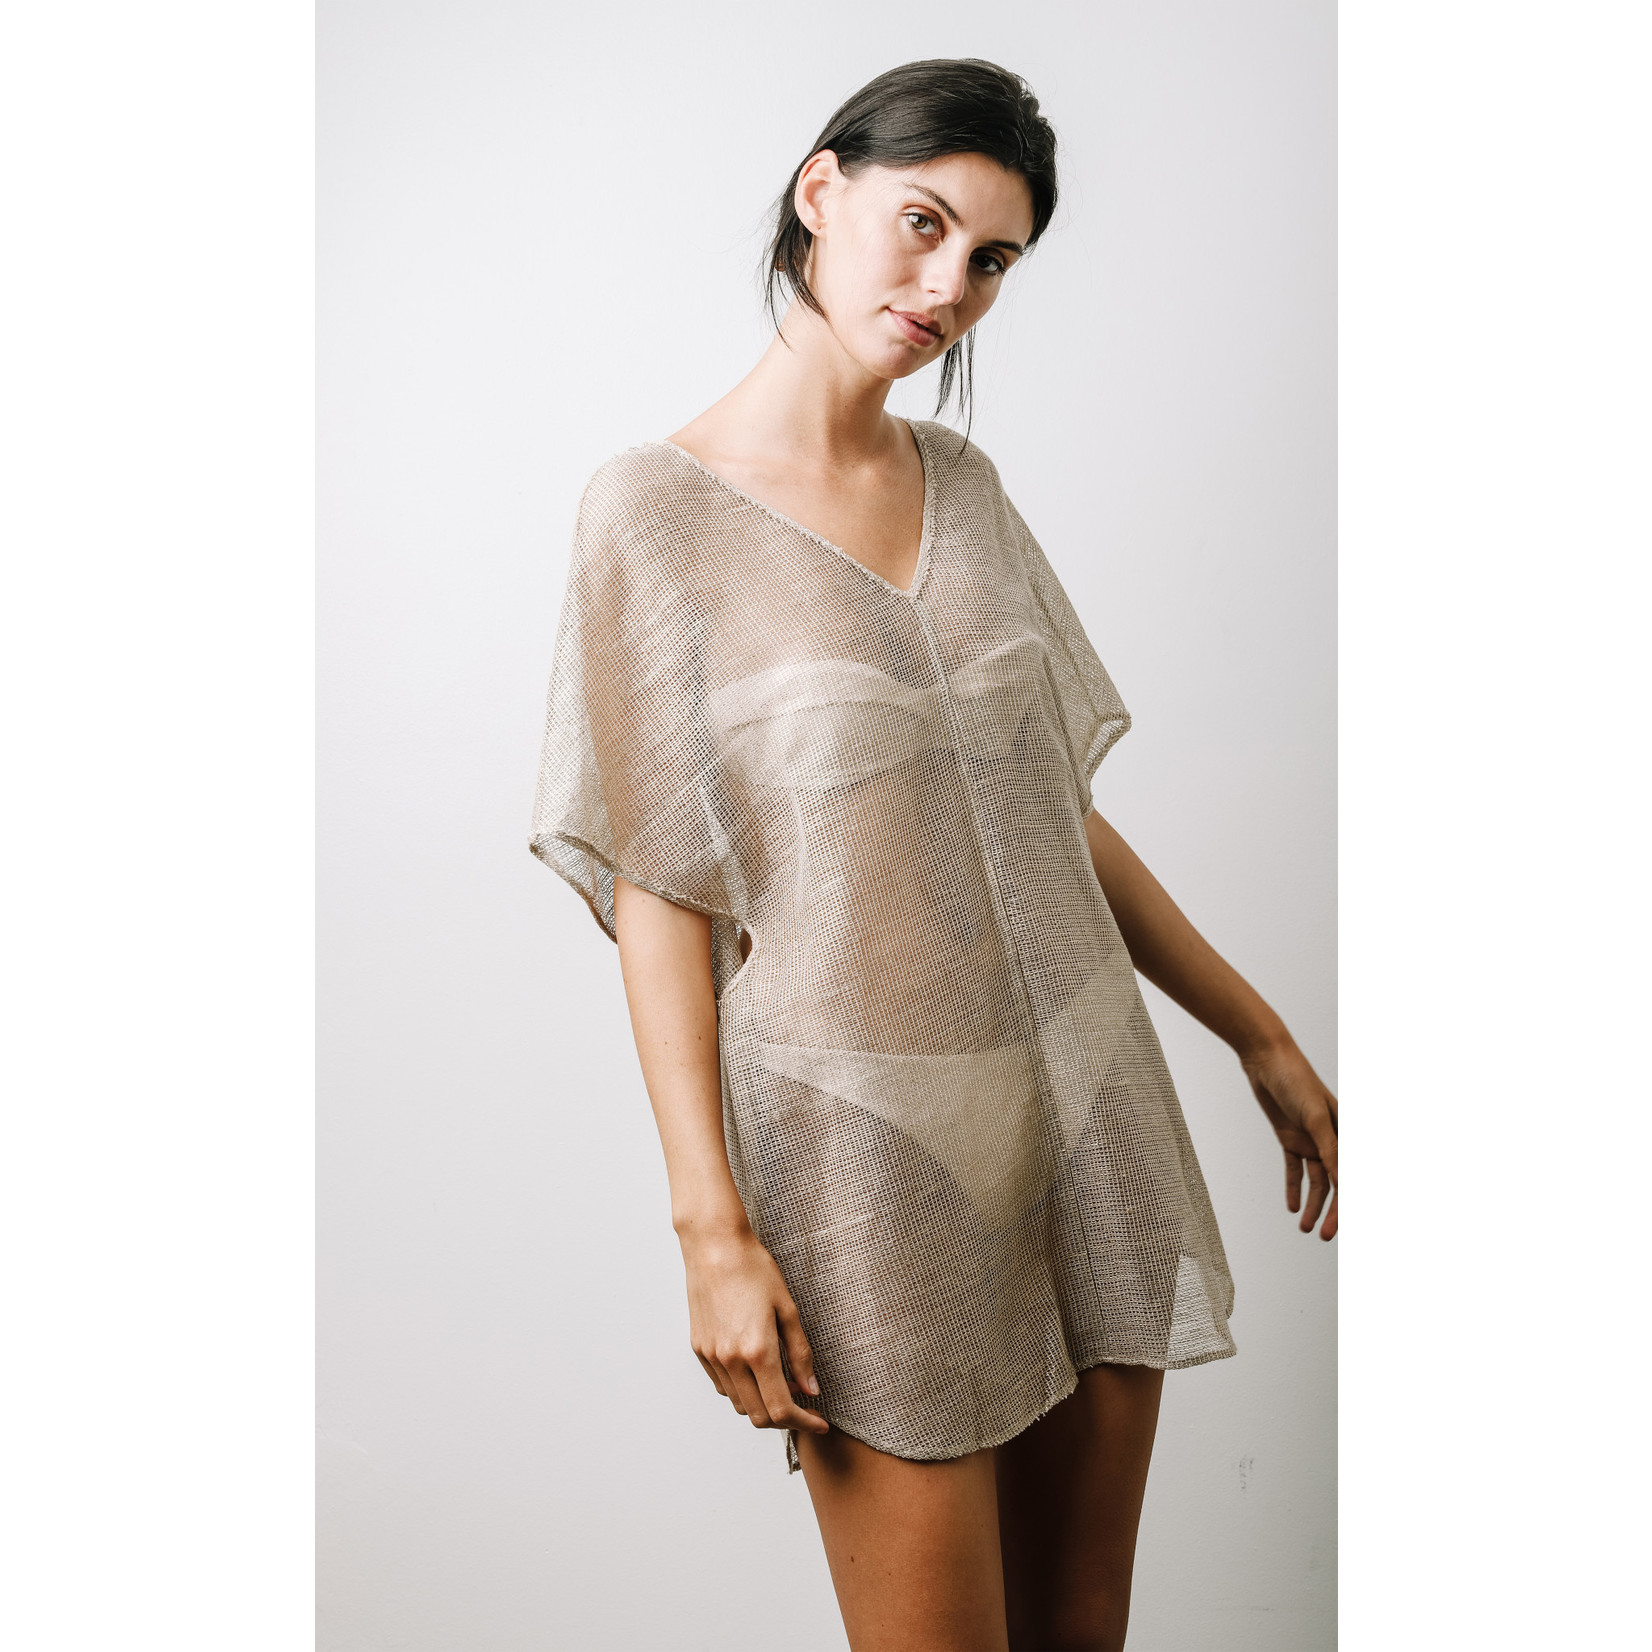 Saint Holiday Overlay Cotton Mesh Gold Wash Dress O/S